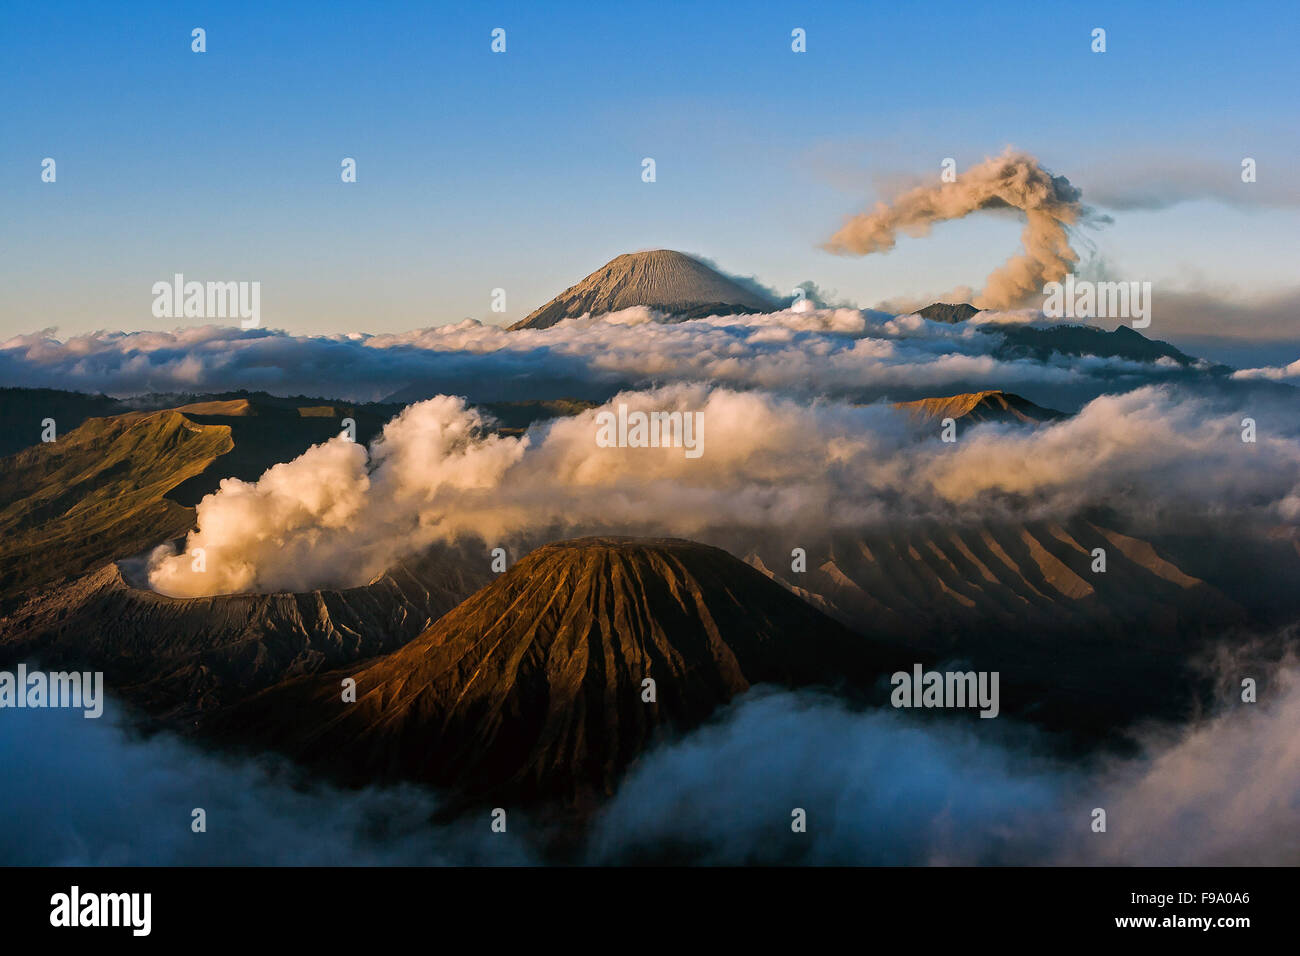 View of Bromo, Batok and Seremu volcanoes, East Java, Indonesia. - Stock Image